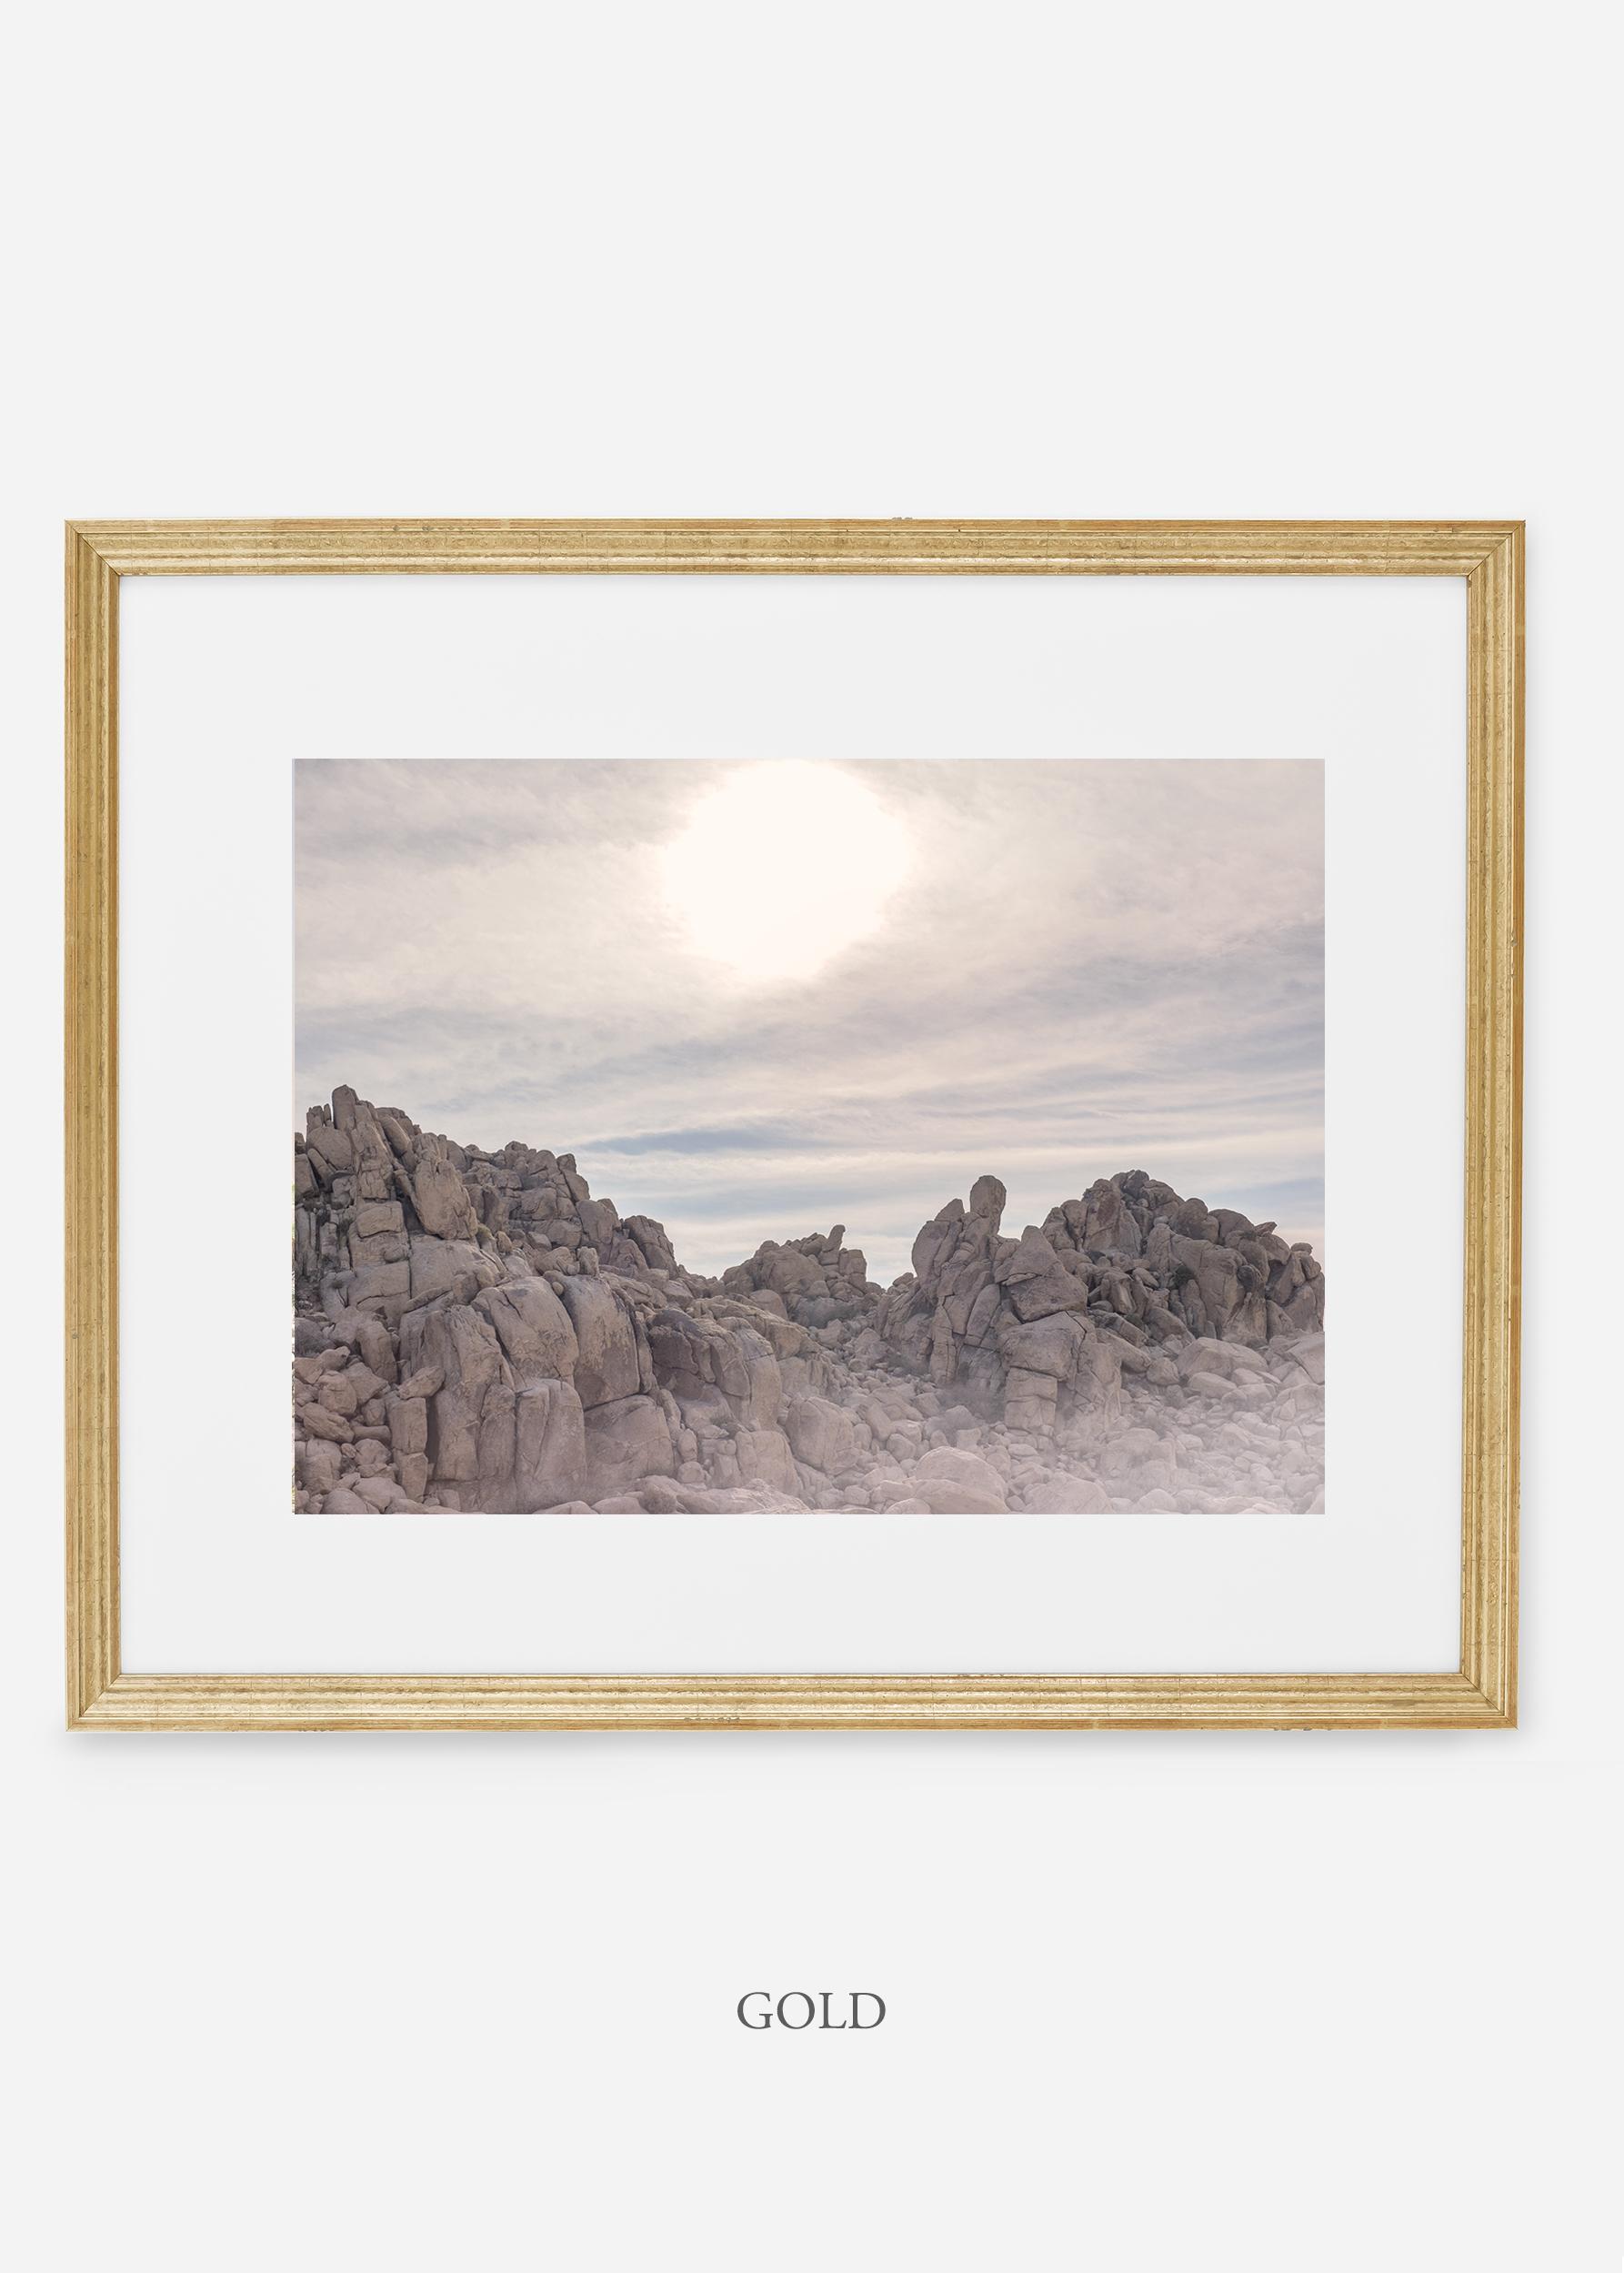 WilderCalifornia_goldframe_JoshuaTree_Rocks_No.3_interiordesign_desert_art.jpg